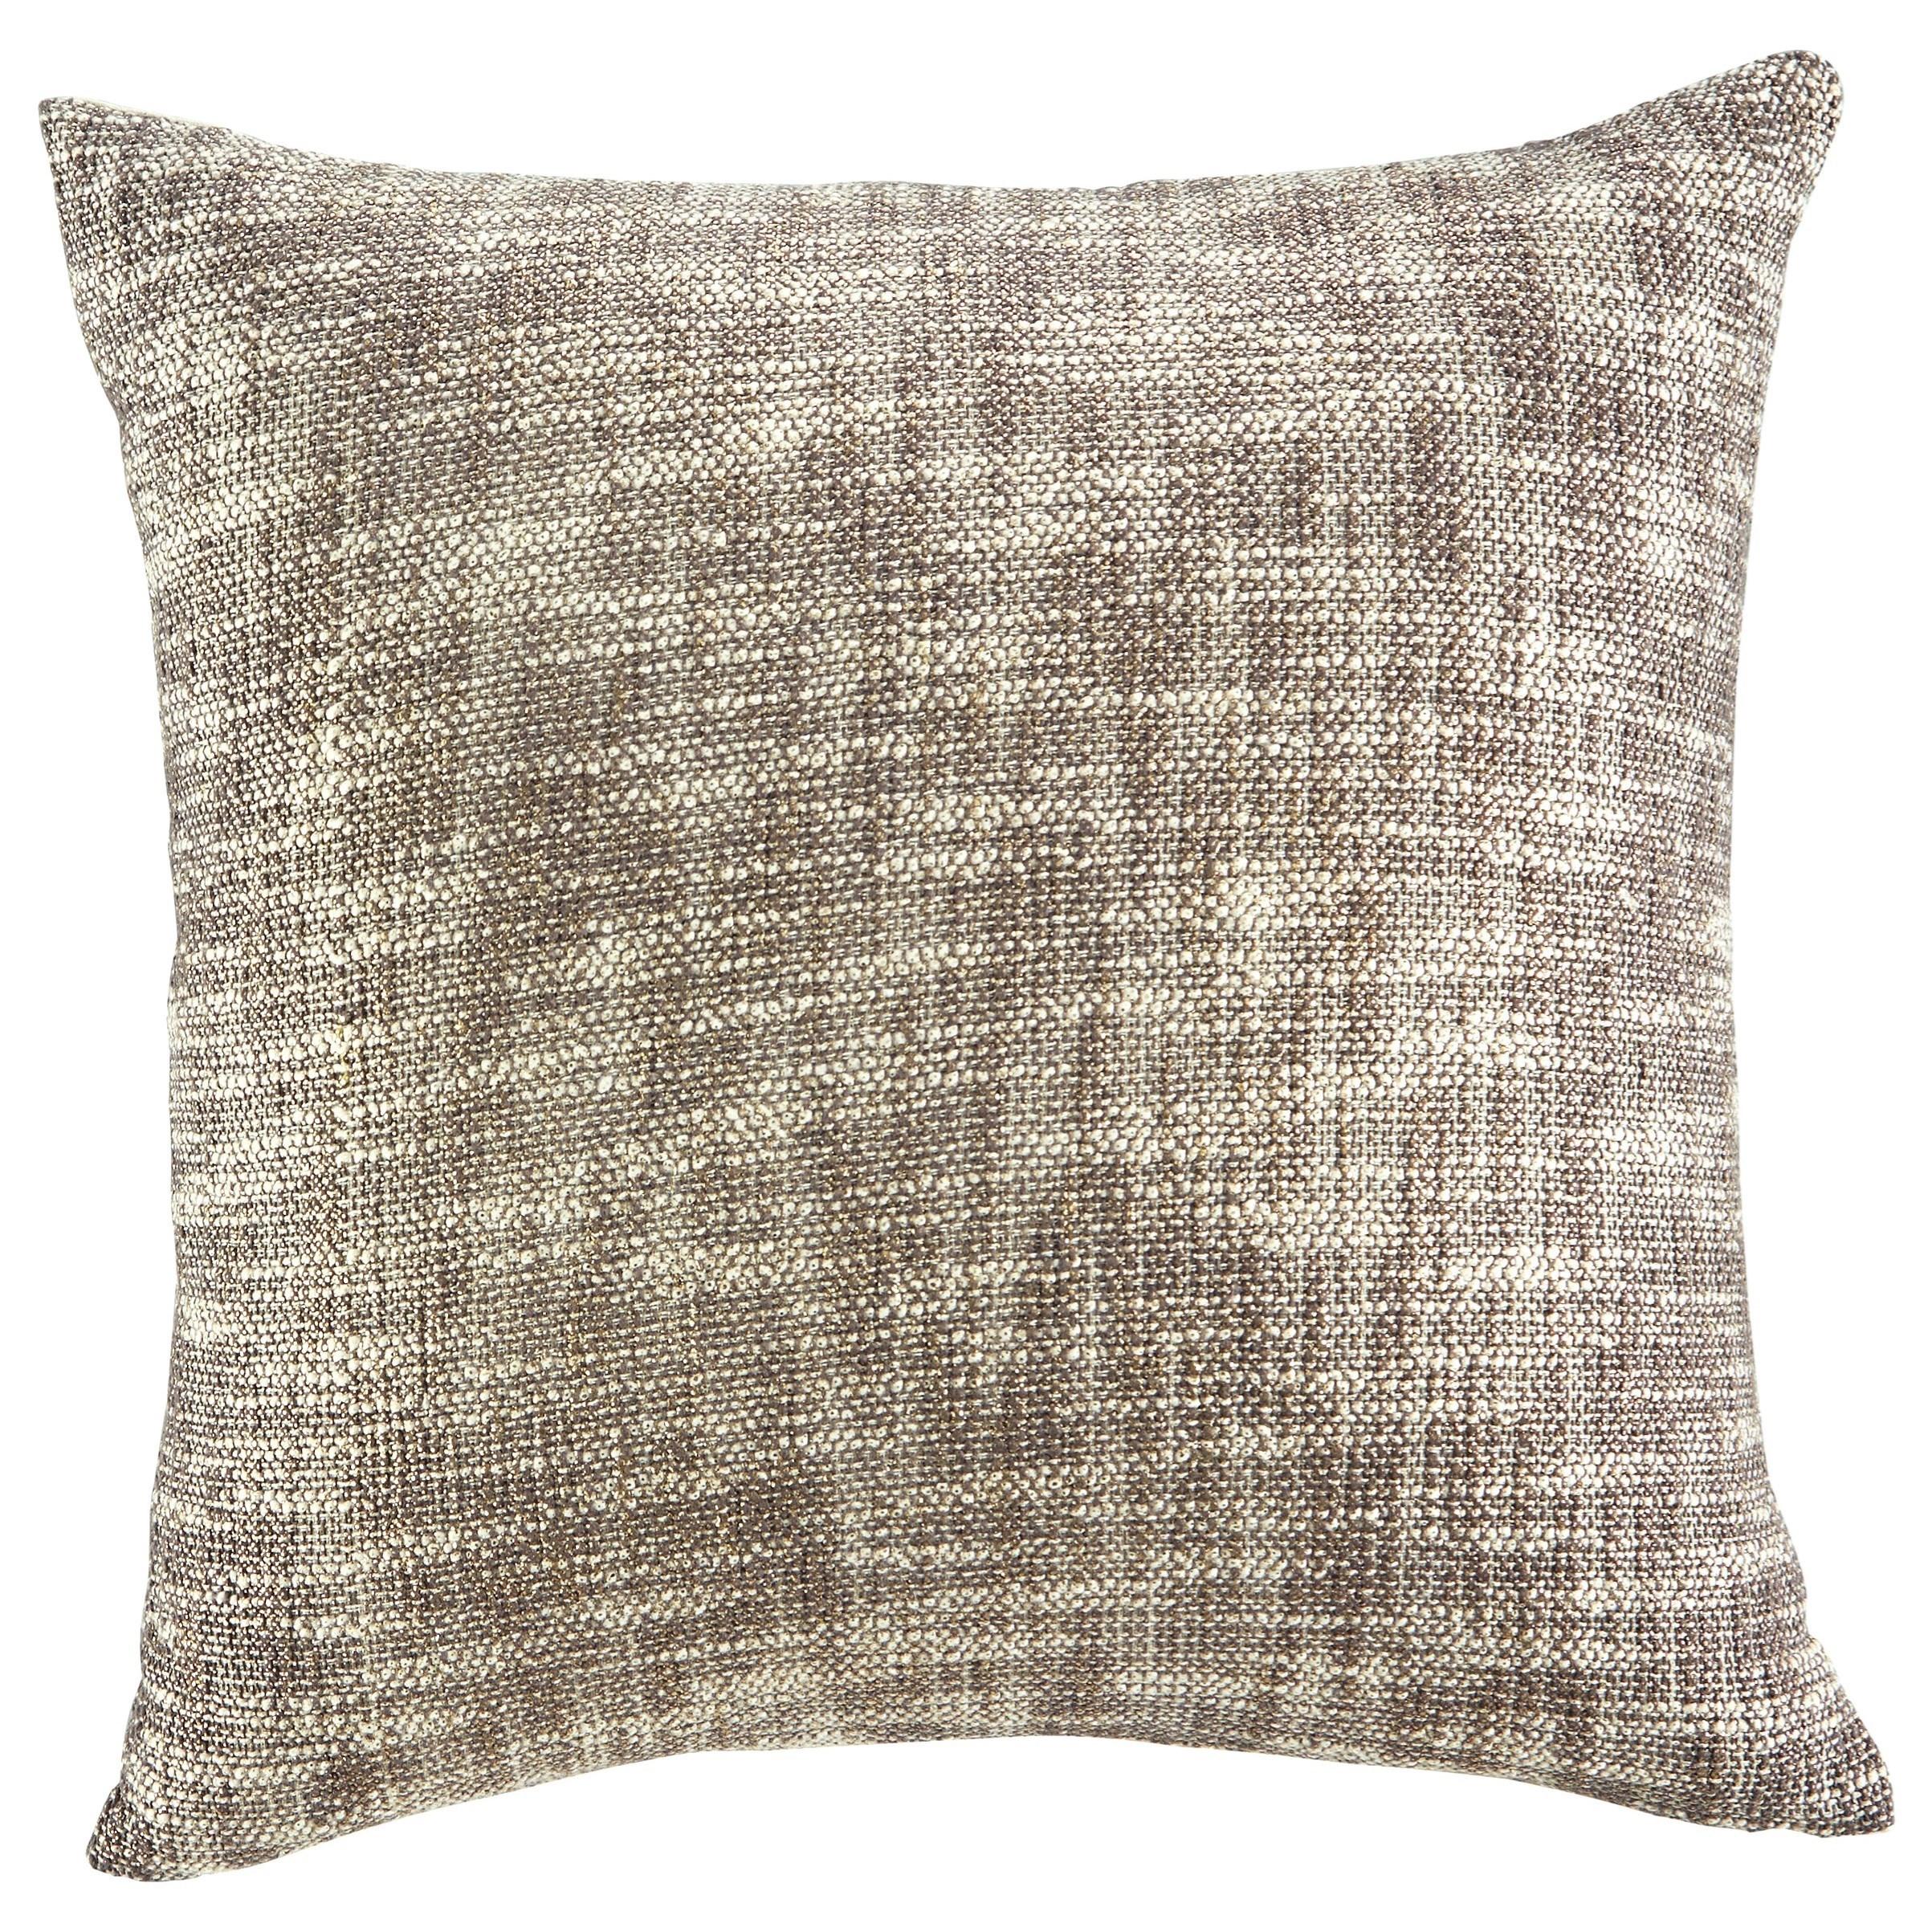 Hullwood Natural/Taupe Pillow